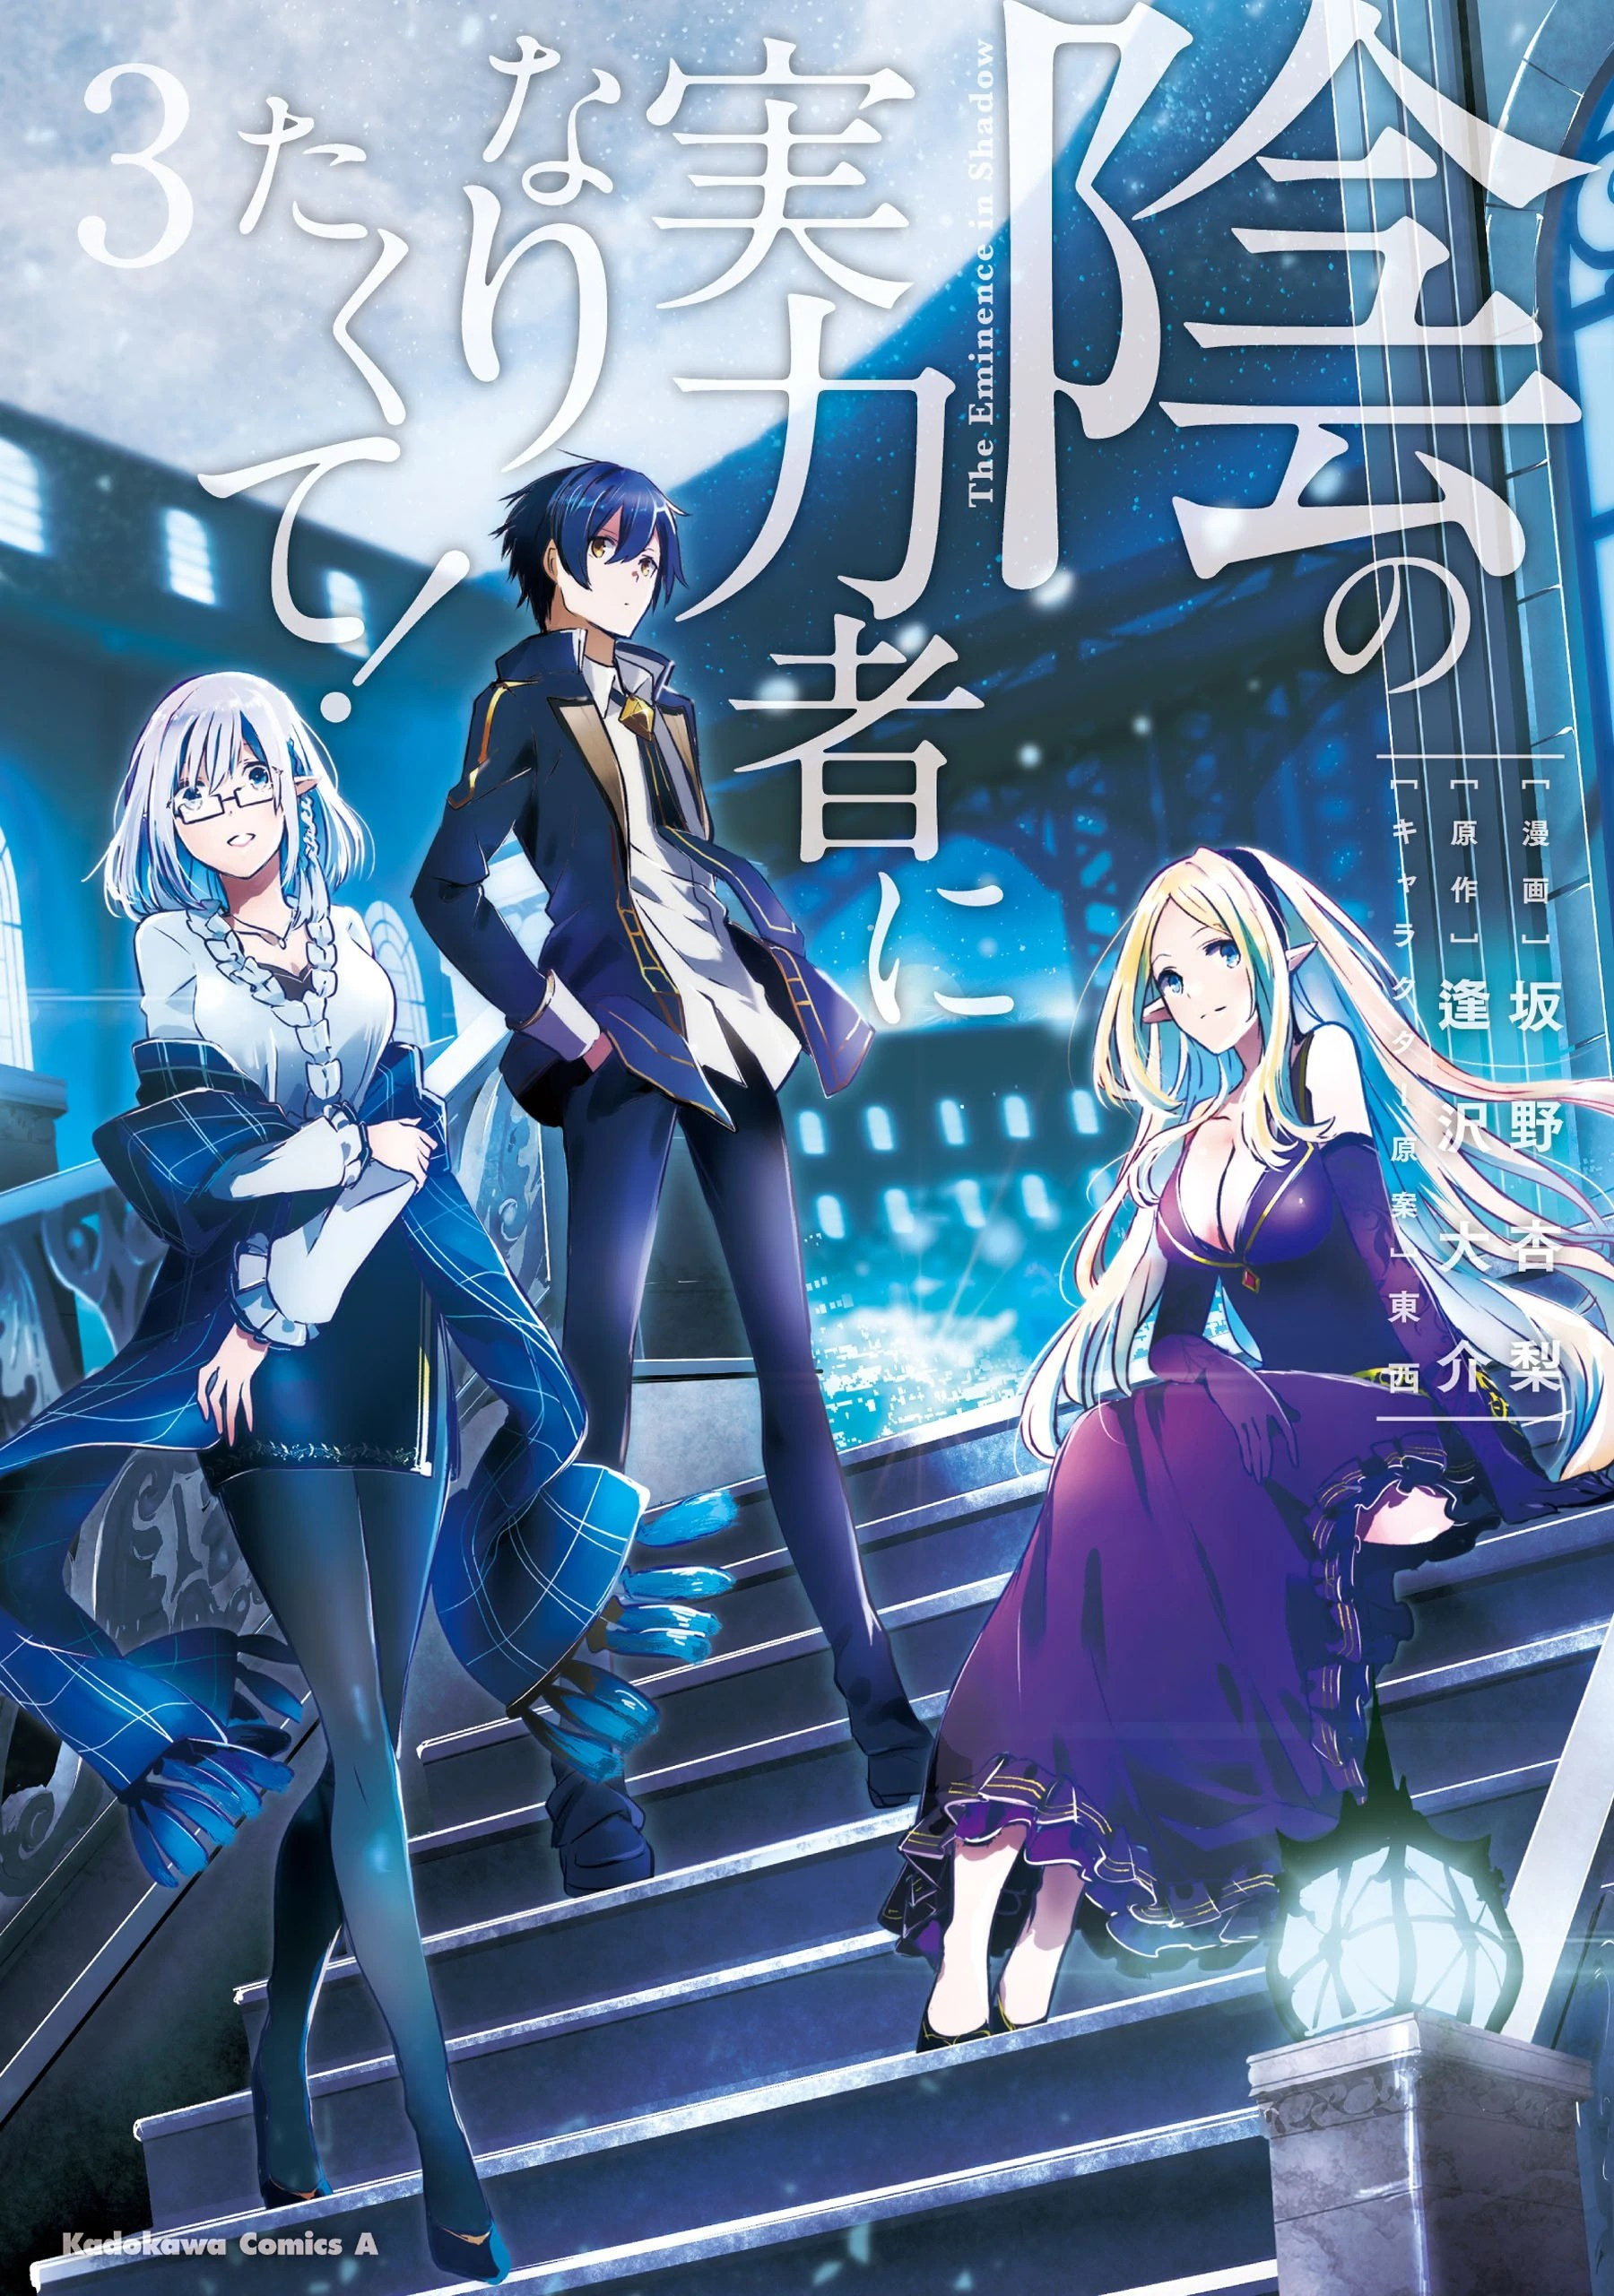 The Eminence In Shadow : eminence, shadow, Manga, Volume, Power, Shadows!, Fandom